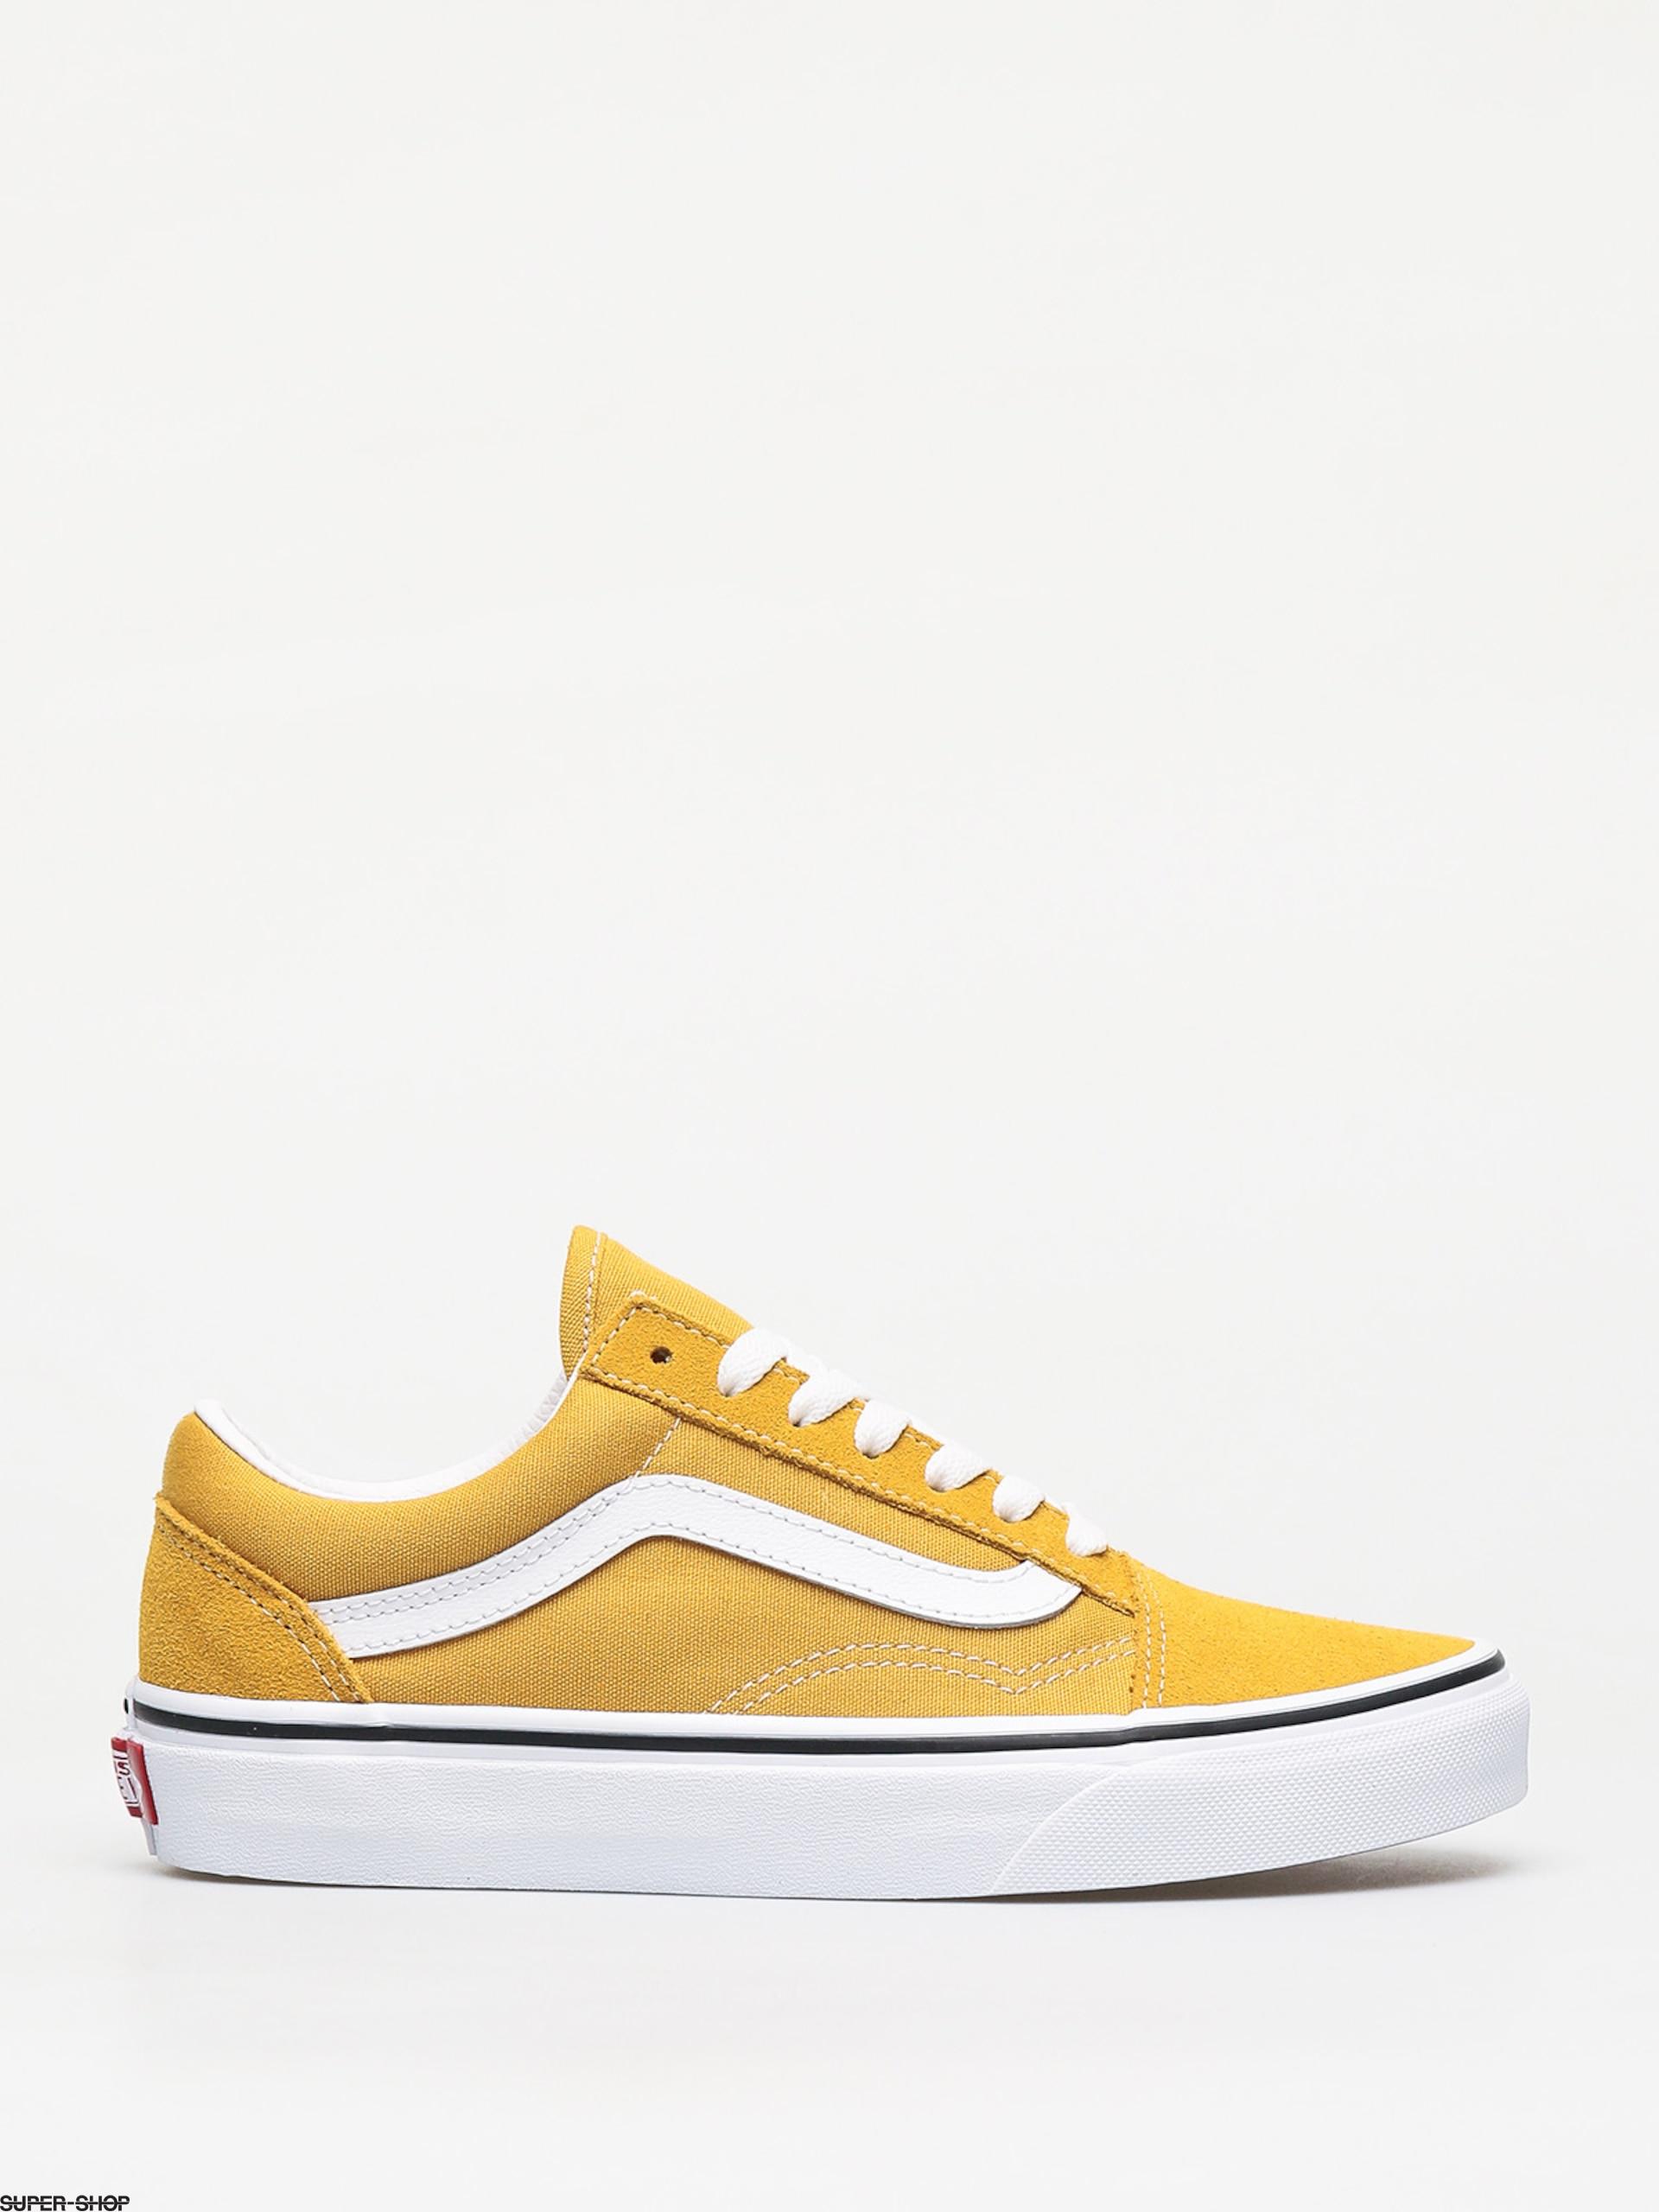 61f30fd02ba 1042555-w1920-vans-old-skool-shoes-yolk-yellow-true-white.jpg